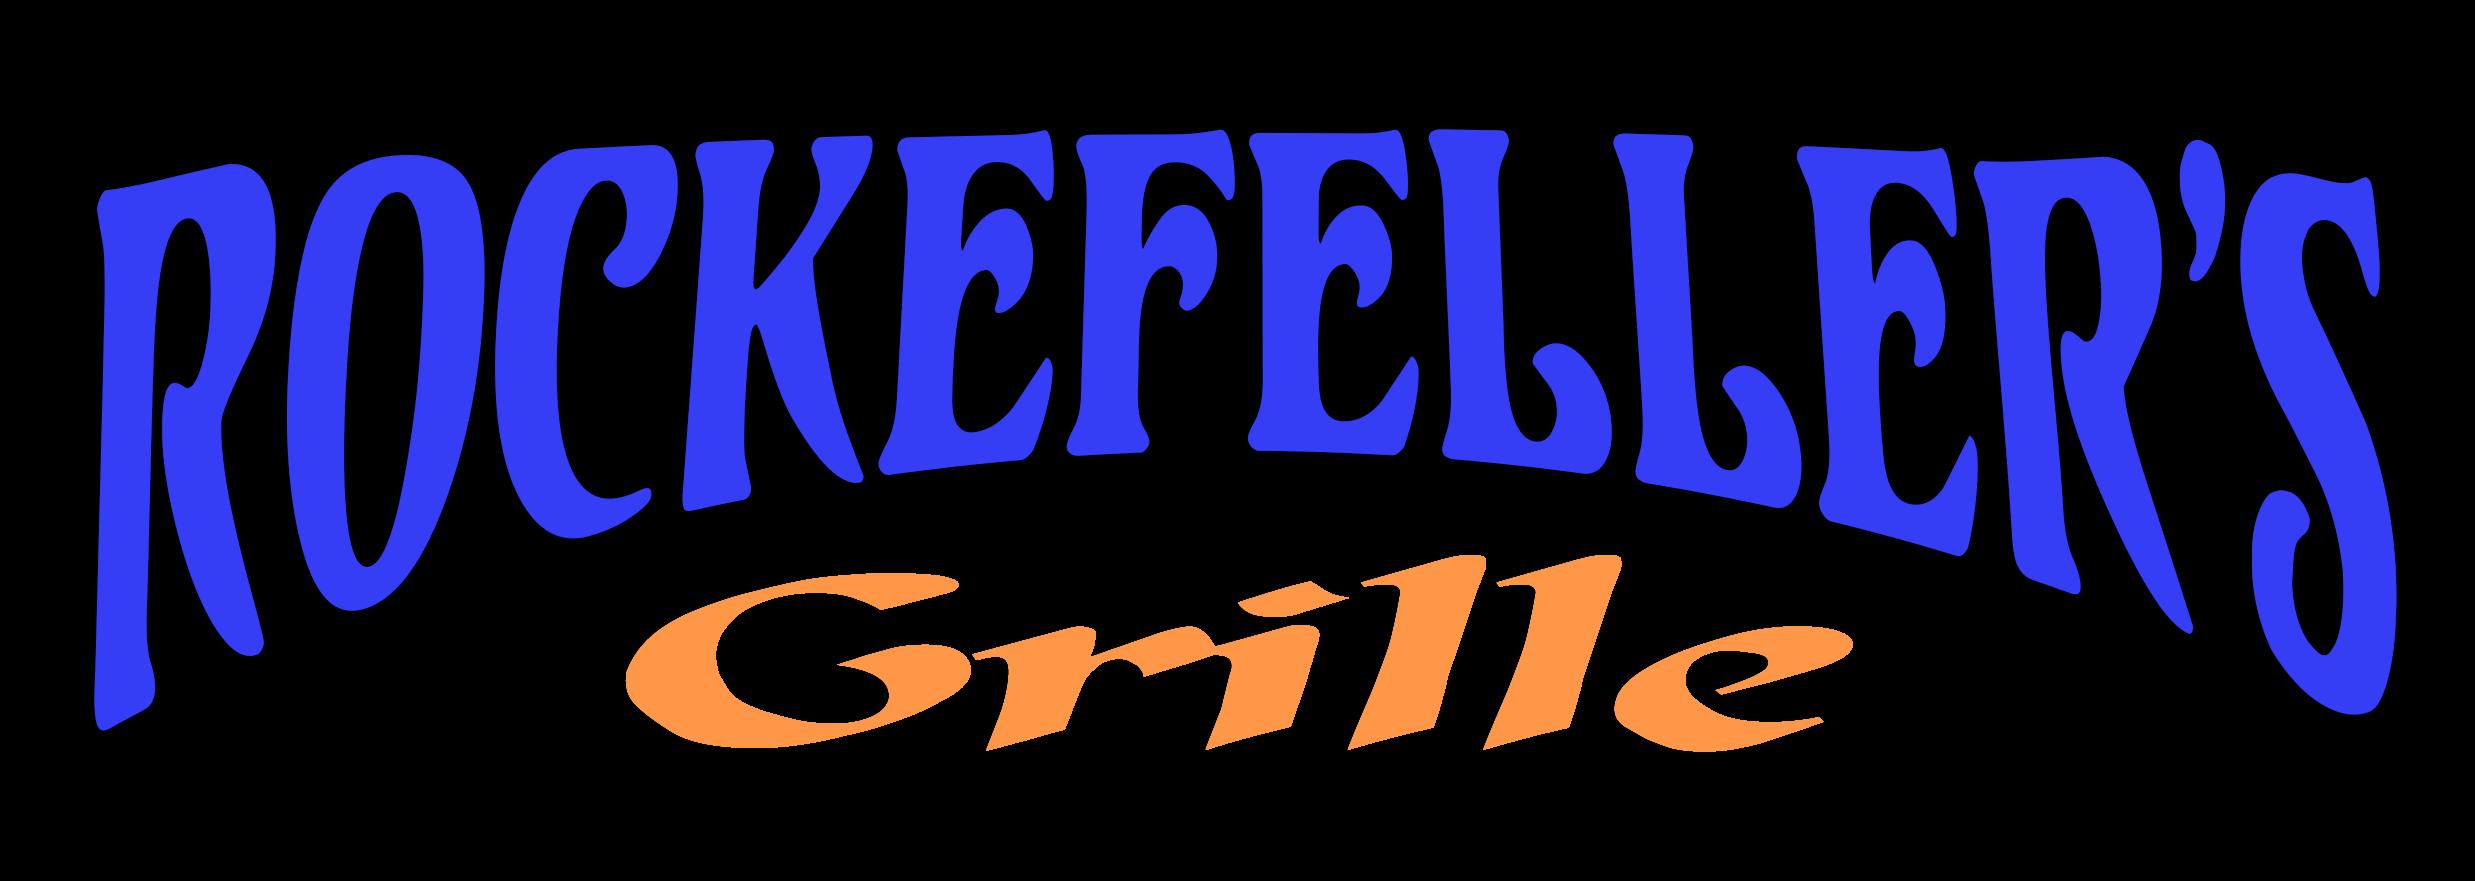 Rockefeller's Grille